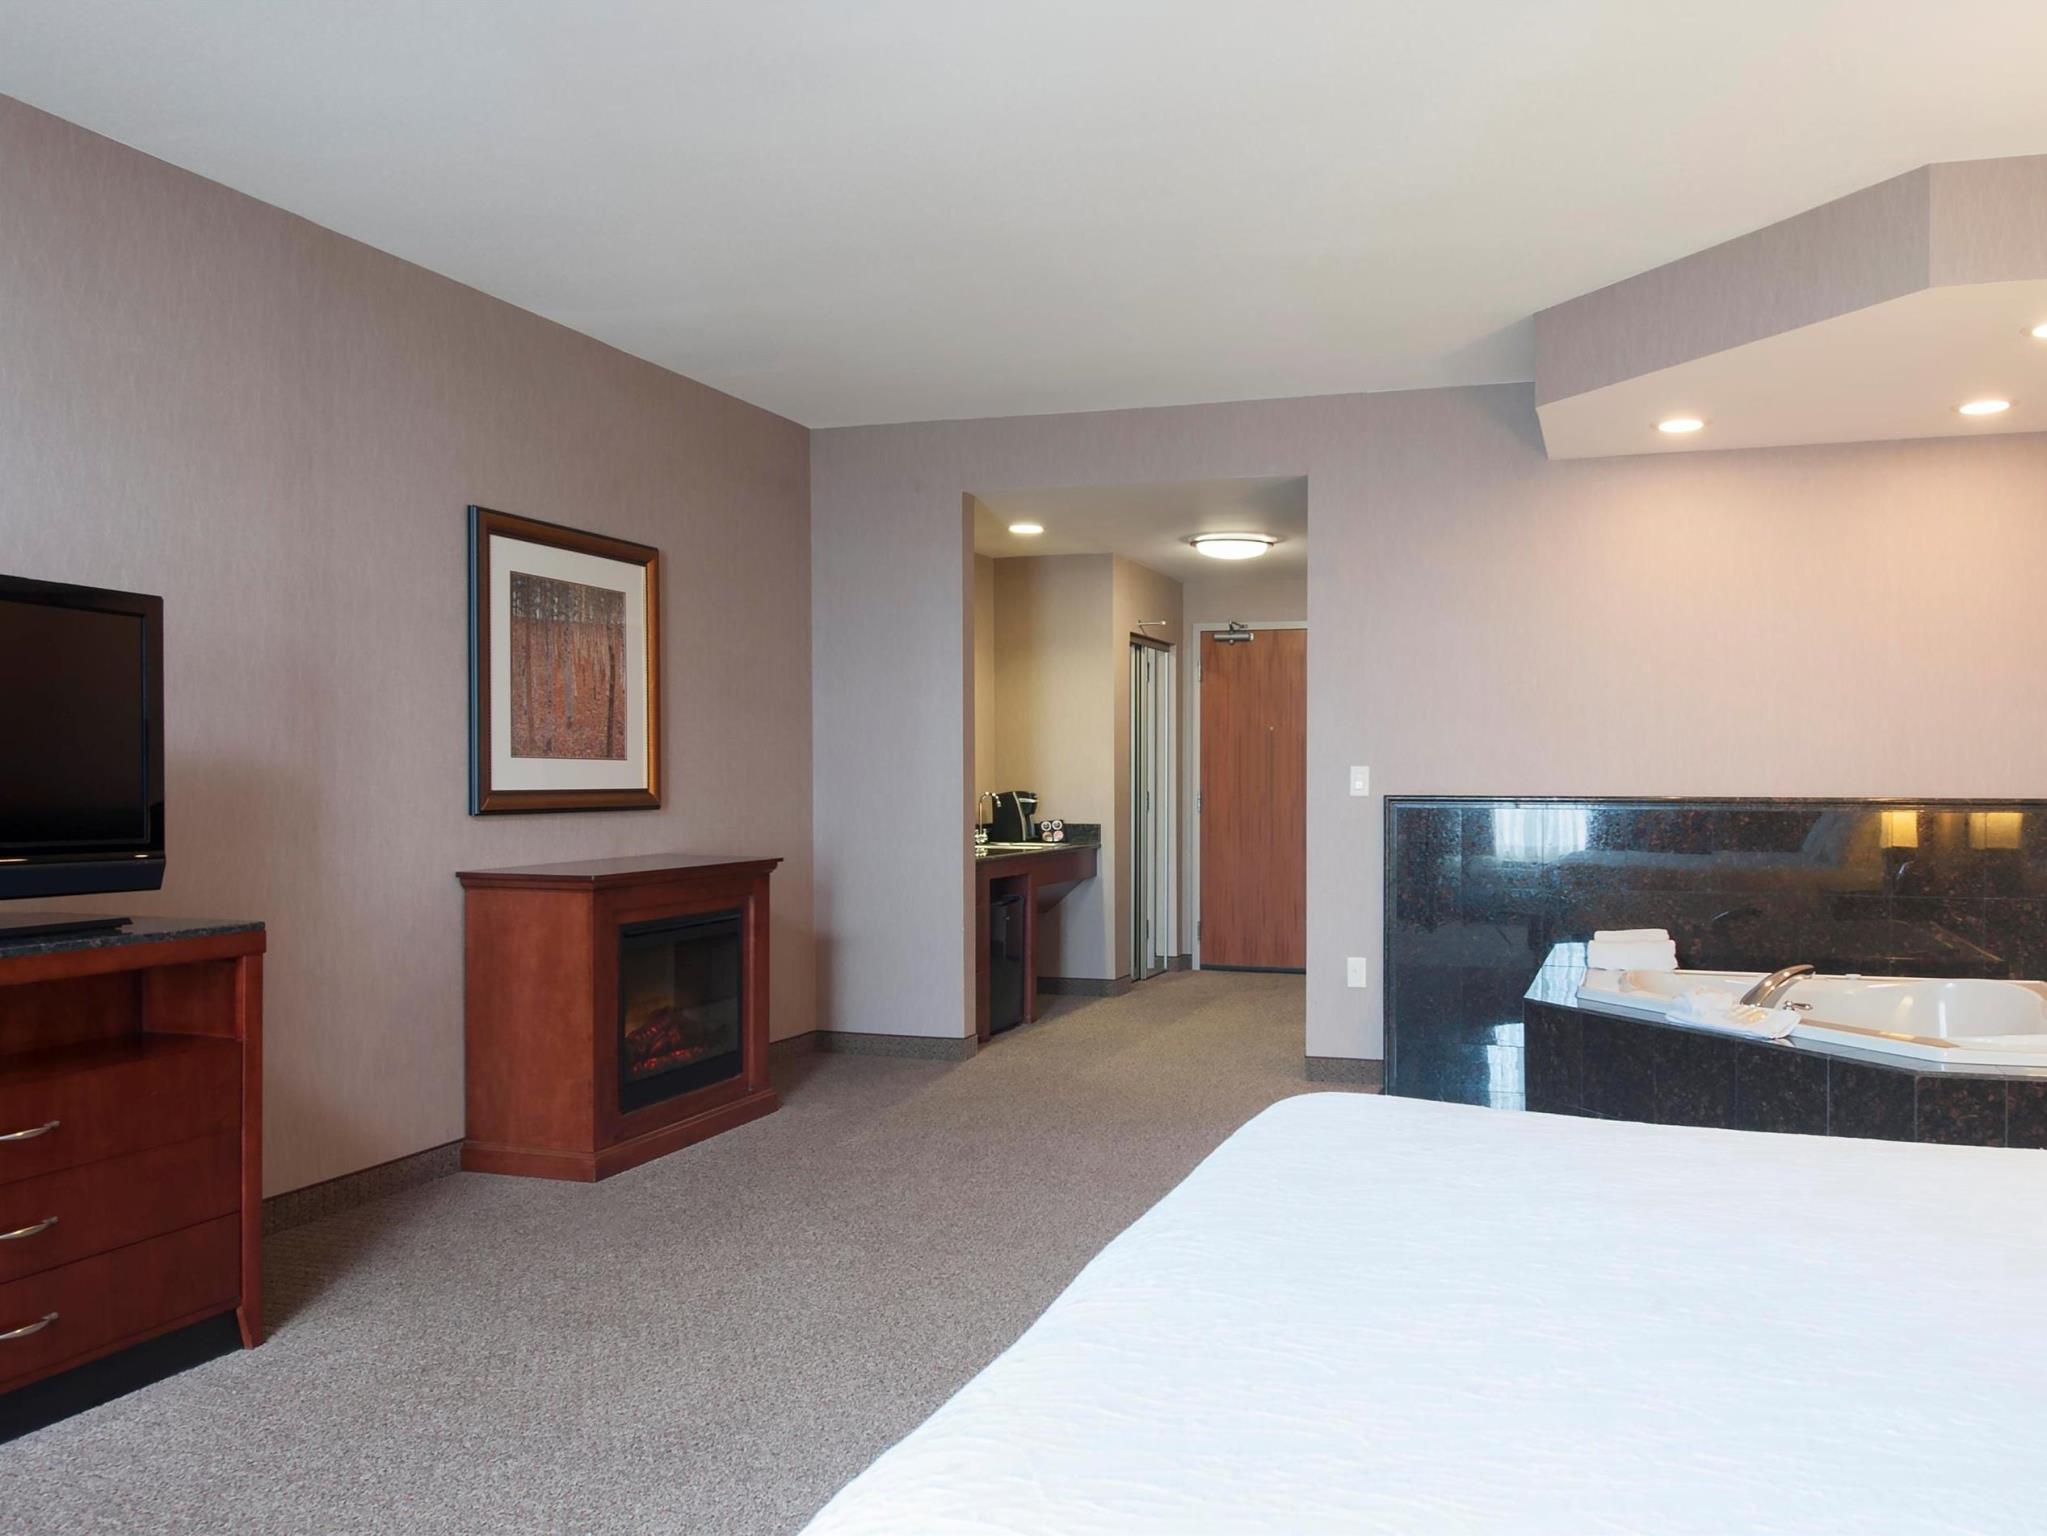 Hilton Garden Inn Indianapolis South Greenwood